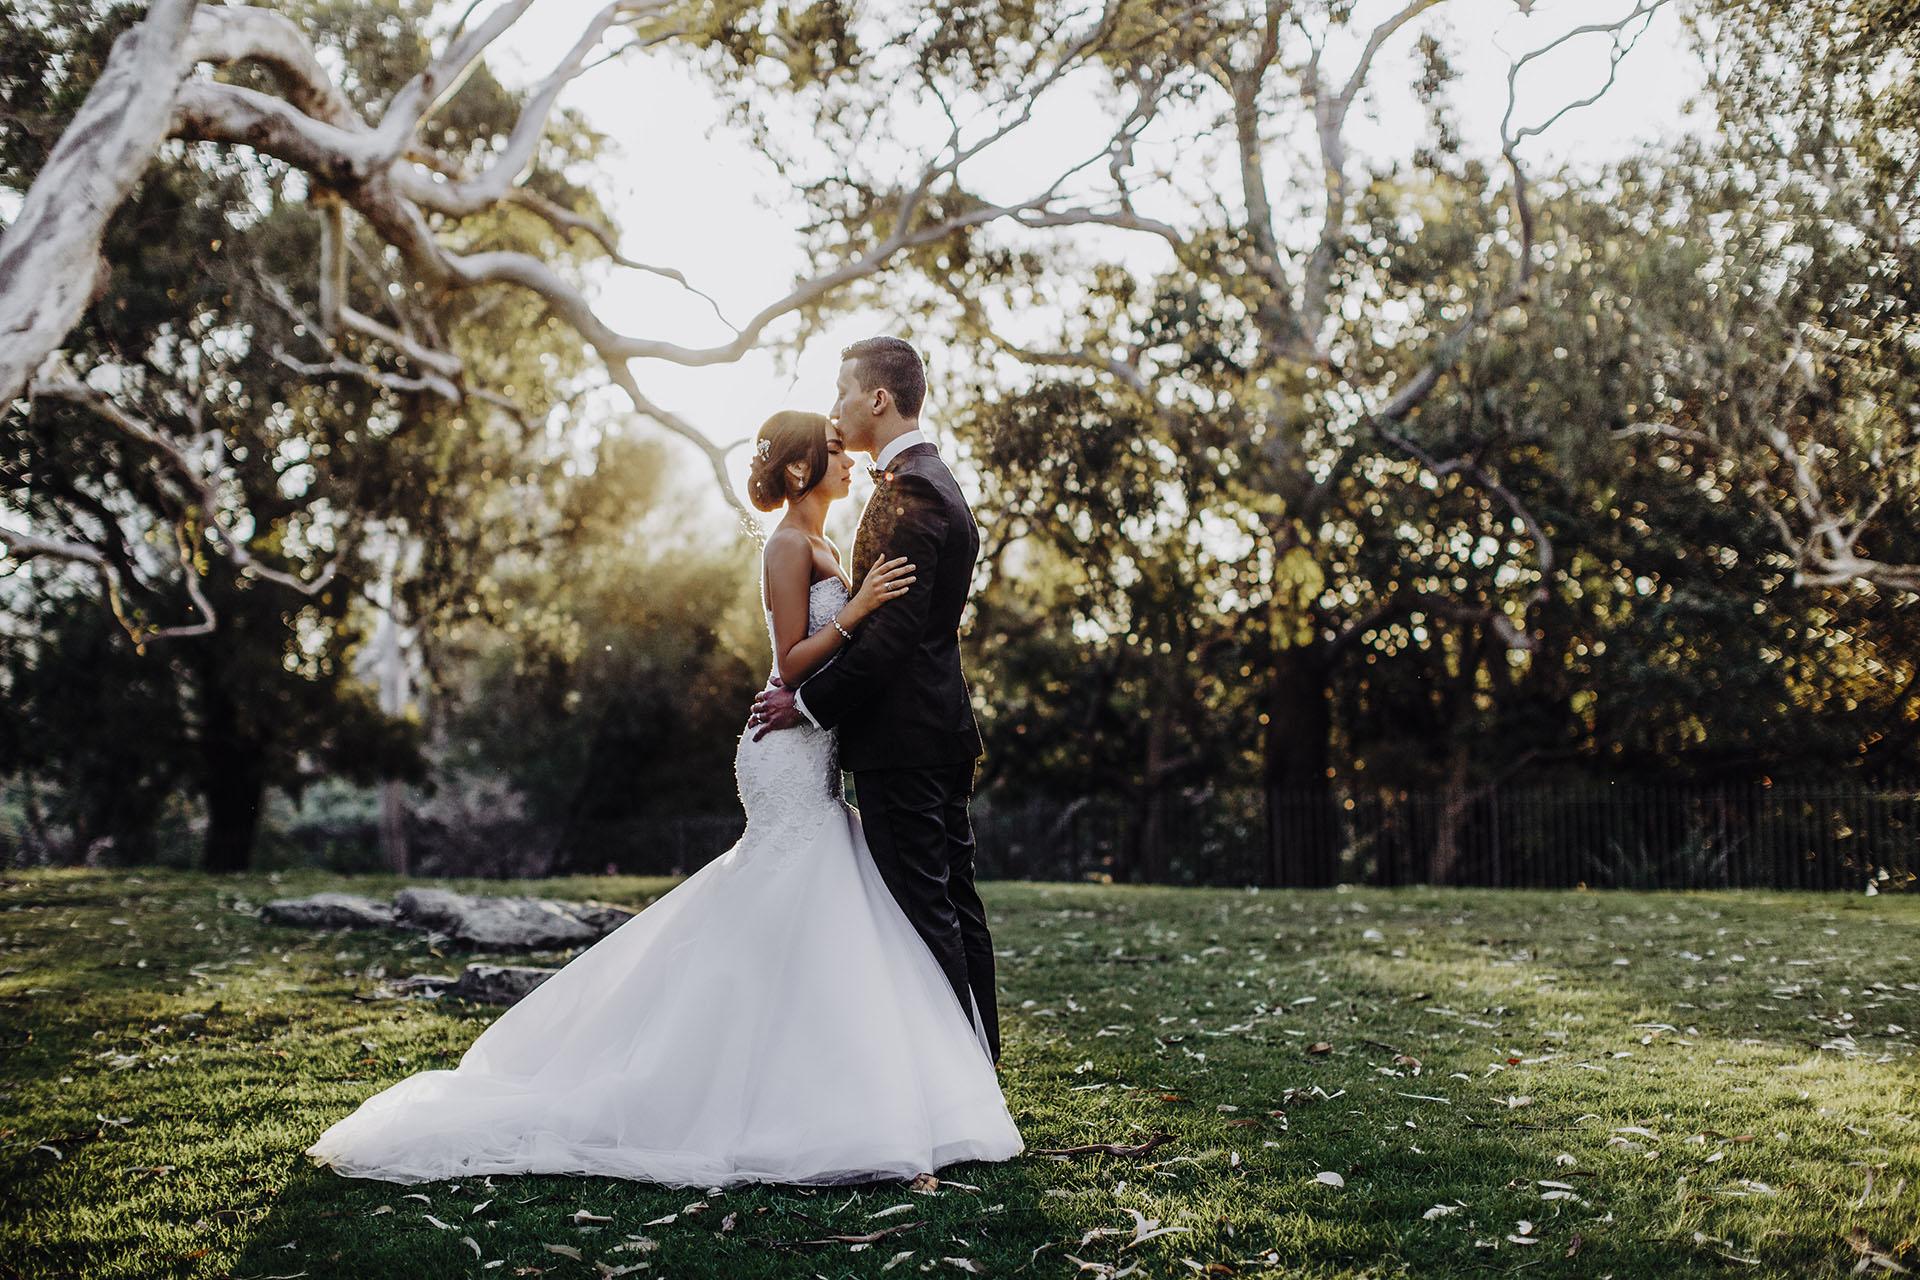 anemotion-wedding-photo-video-10.jpg